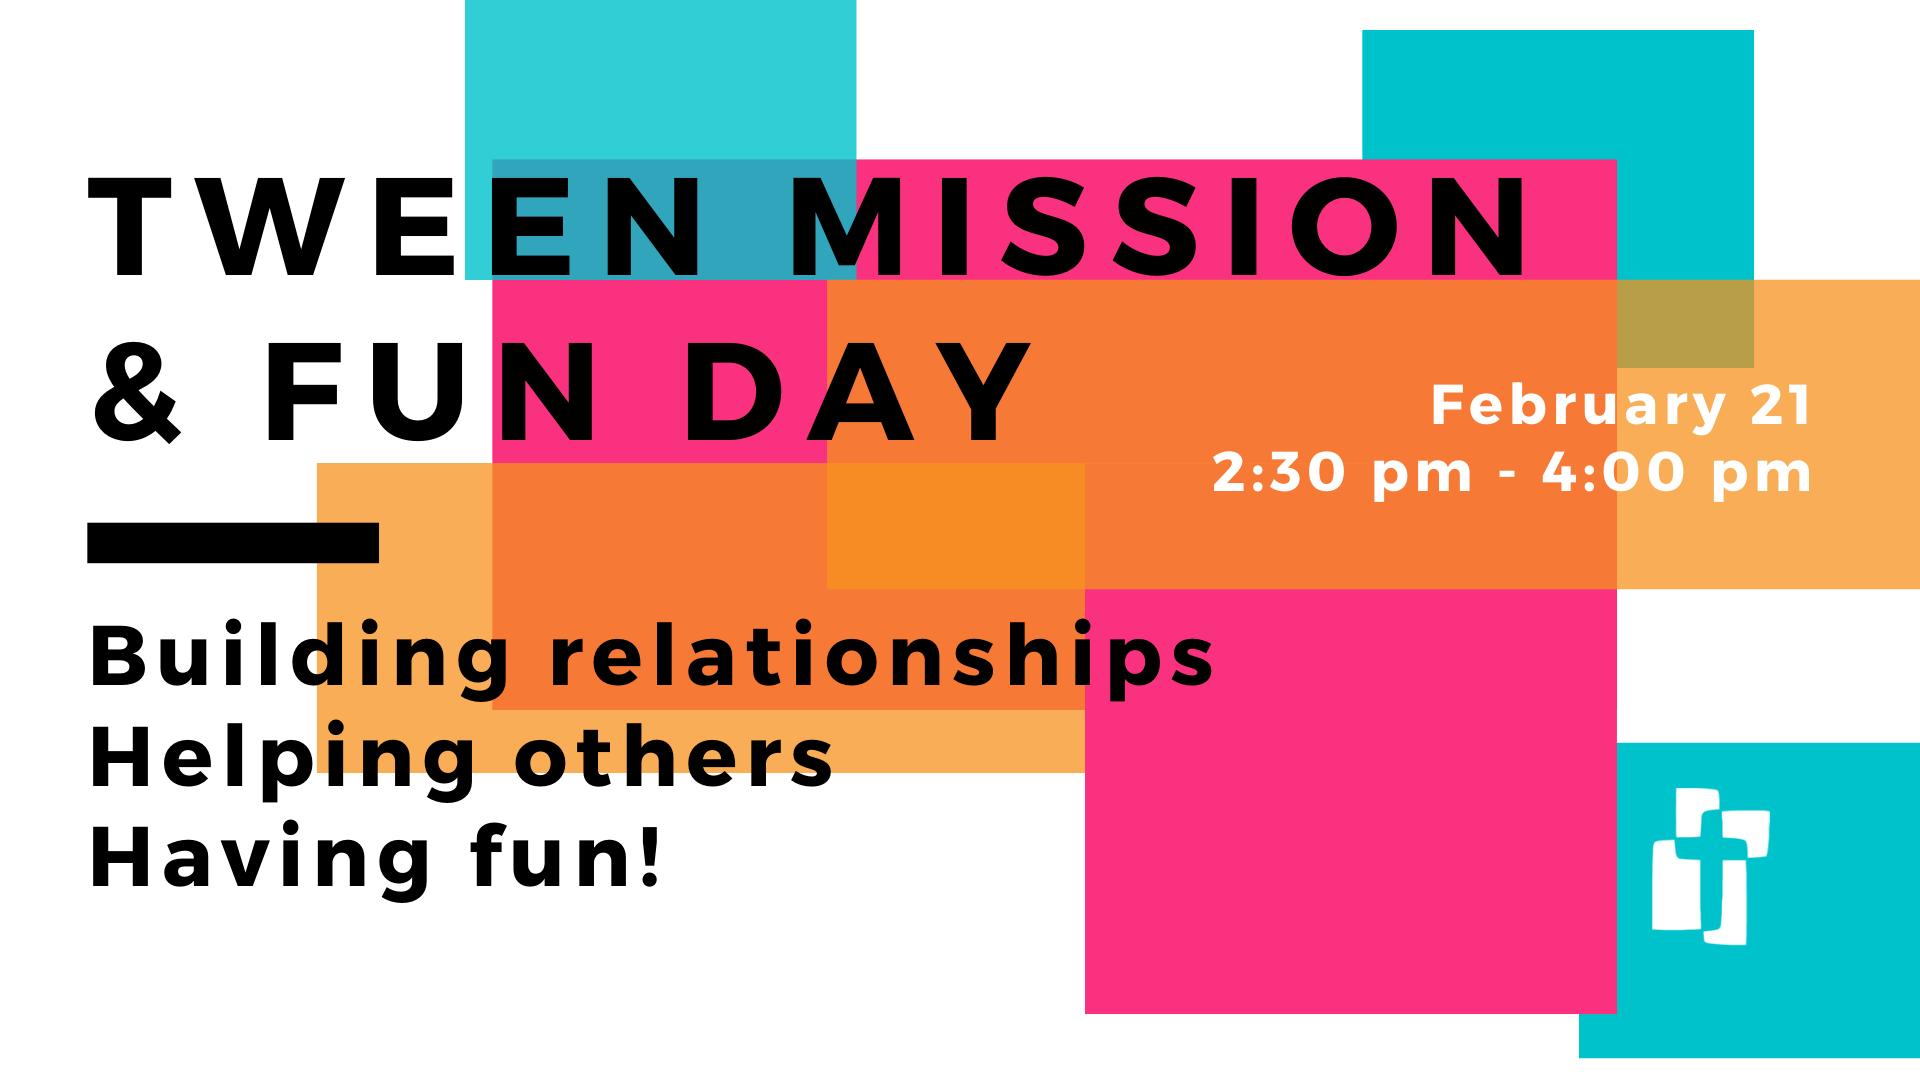 Tween Mission Fun Day